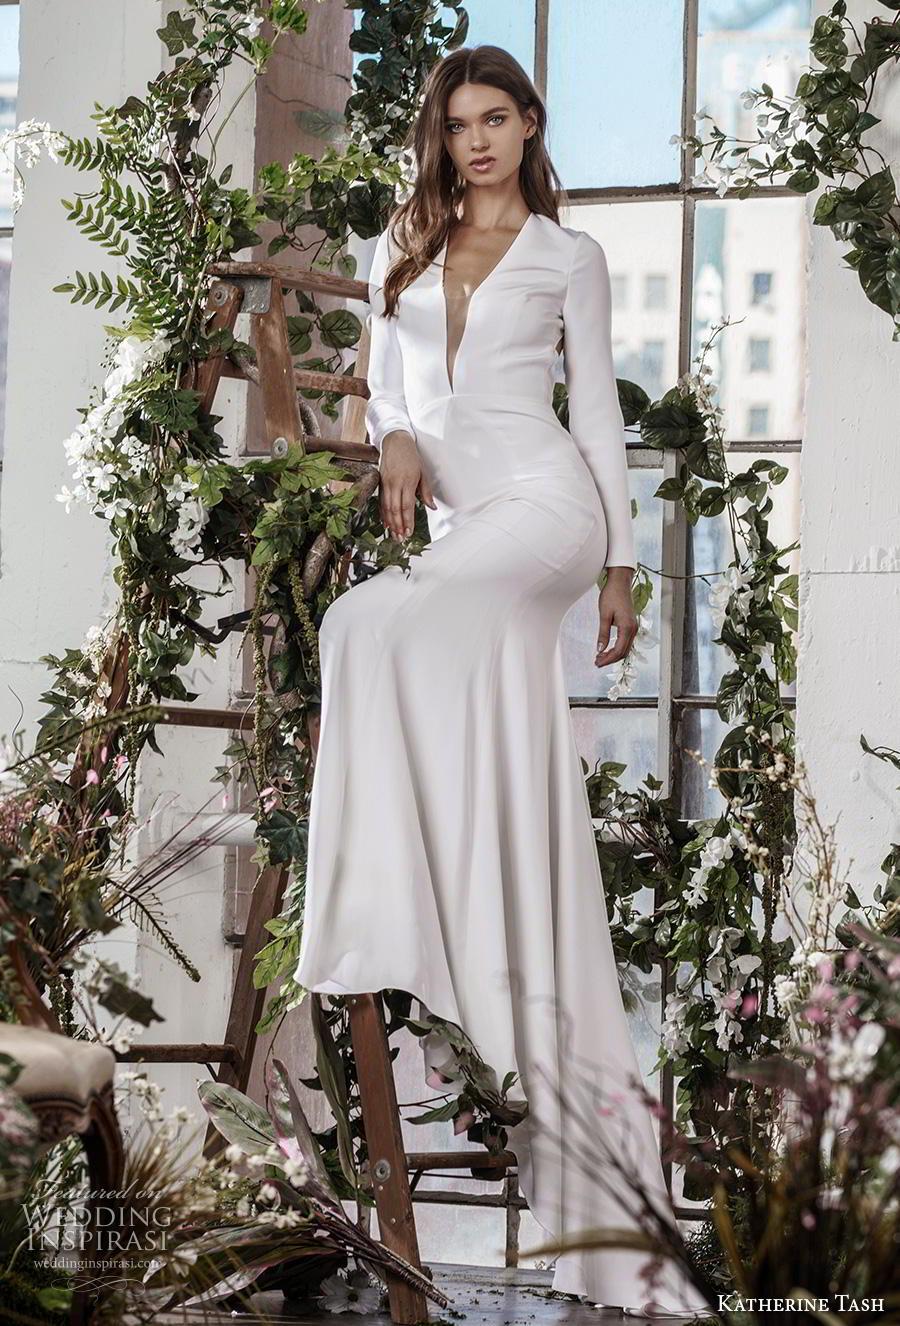 katherine tash fall 2019 bridal long sleeves deep plunging v neck simple clean minimalist elegant sheath wedding dress low keyhole back sweep train (4) mv